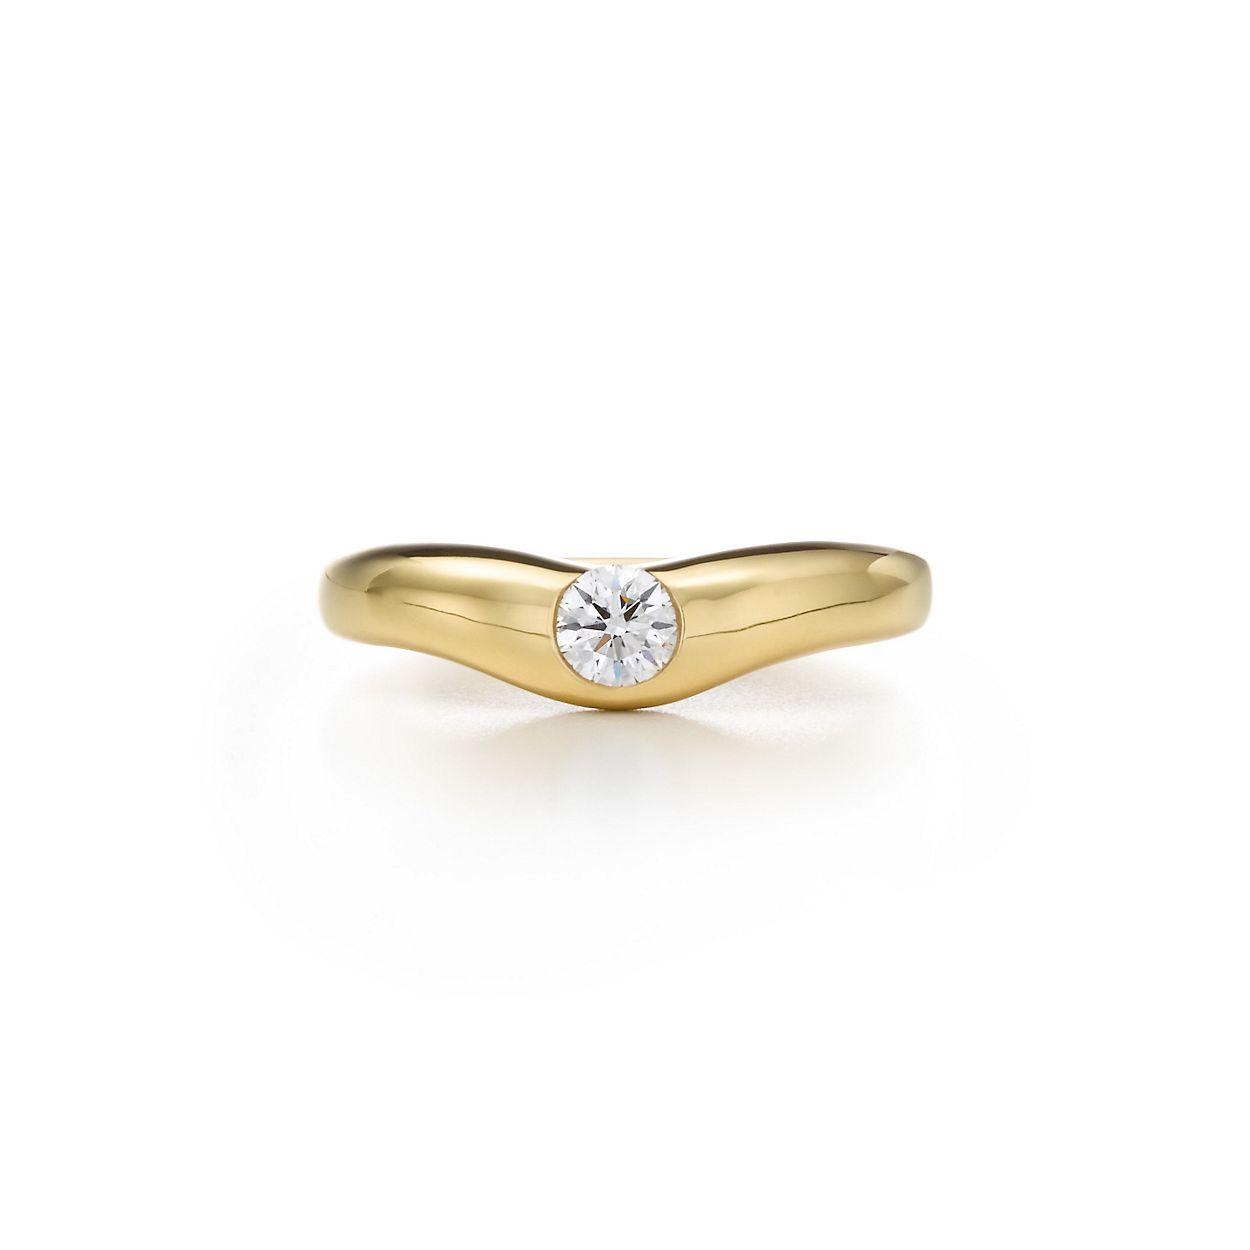 Elsa Peretti wedding band ring with diamonds in 18k gold - Size 4 1/2 Tiffany & Co. vL8FbbDNIy